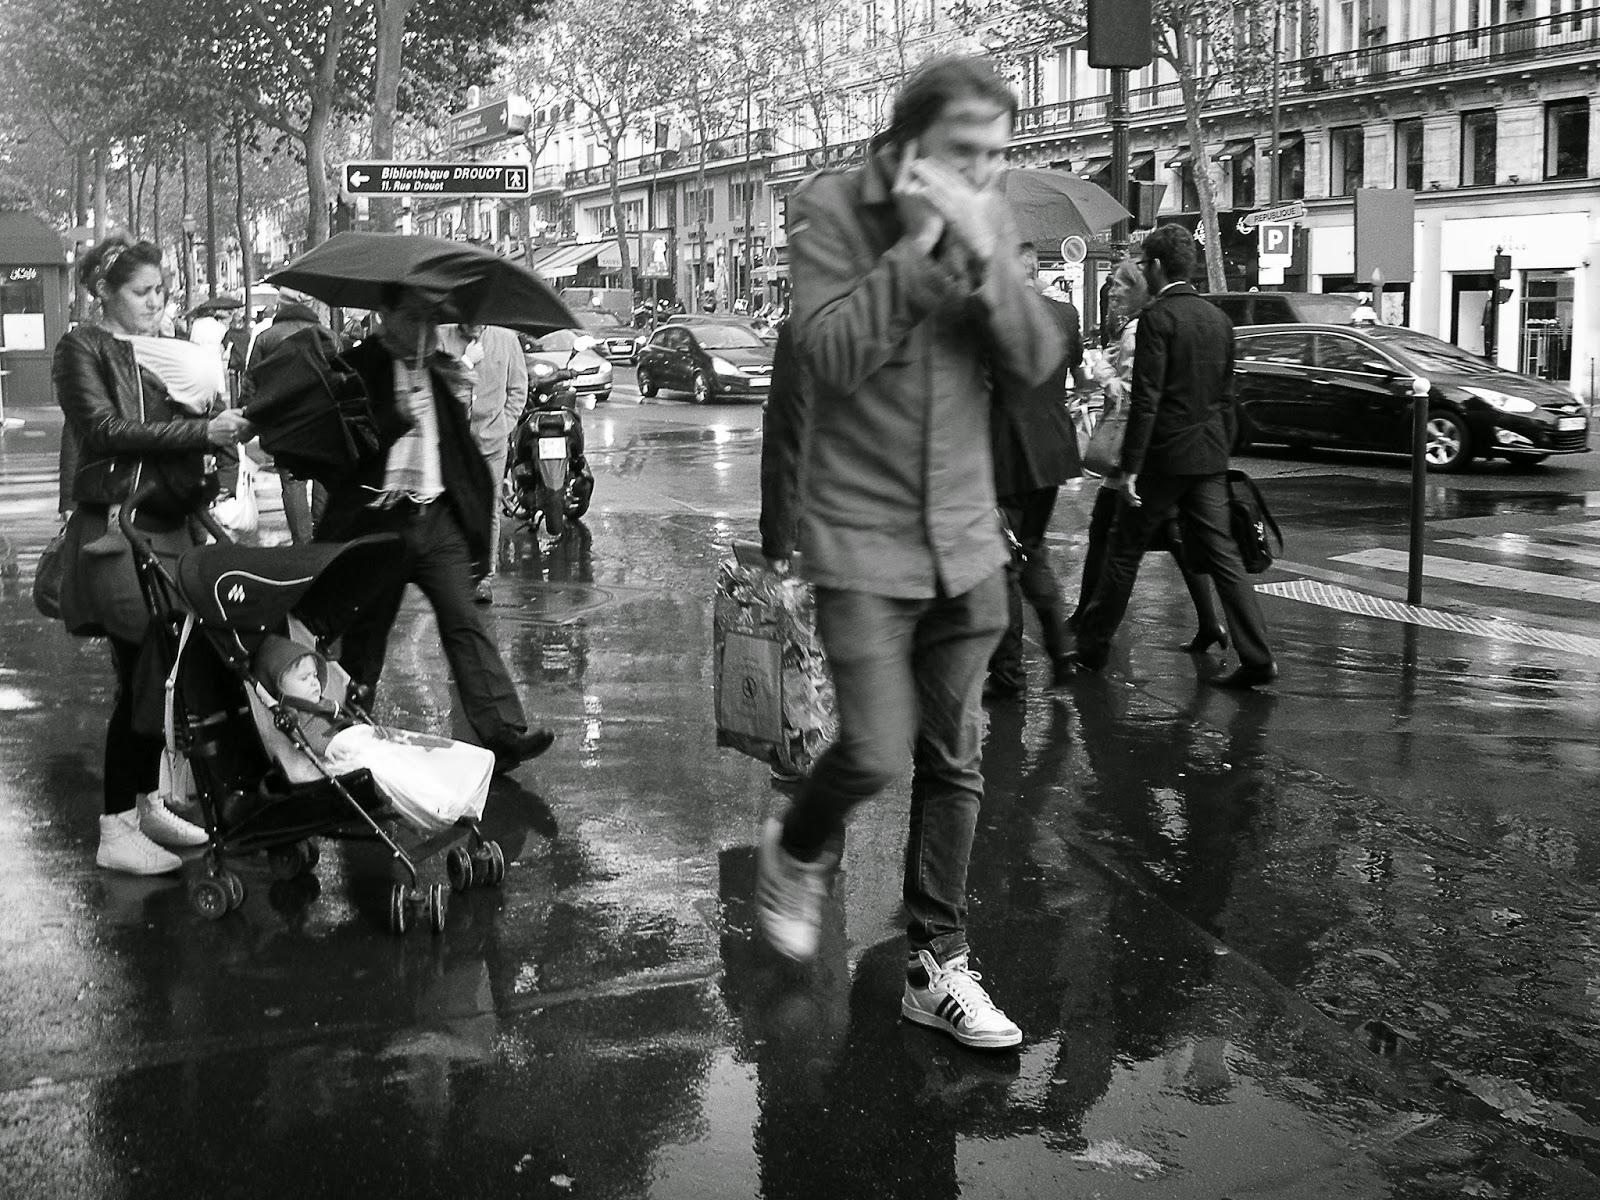 Street Photography Pluvieux 02 Street Photography Sergi